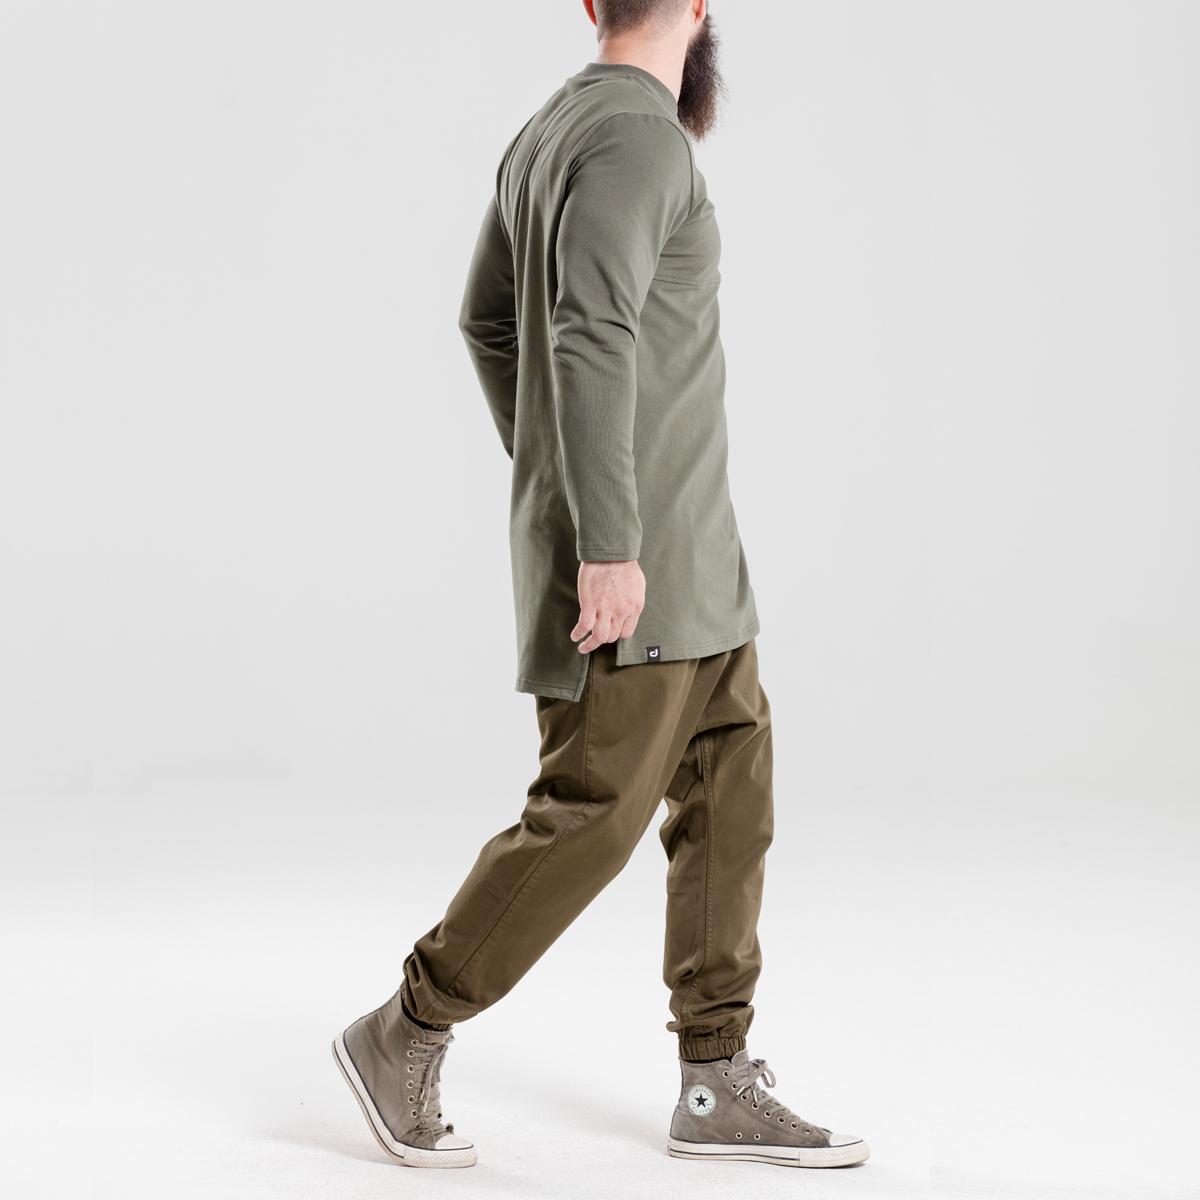 saroual jeans usual kaki dcjeans ensemble profil